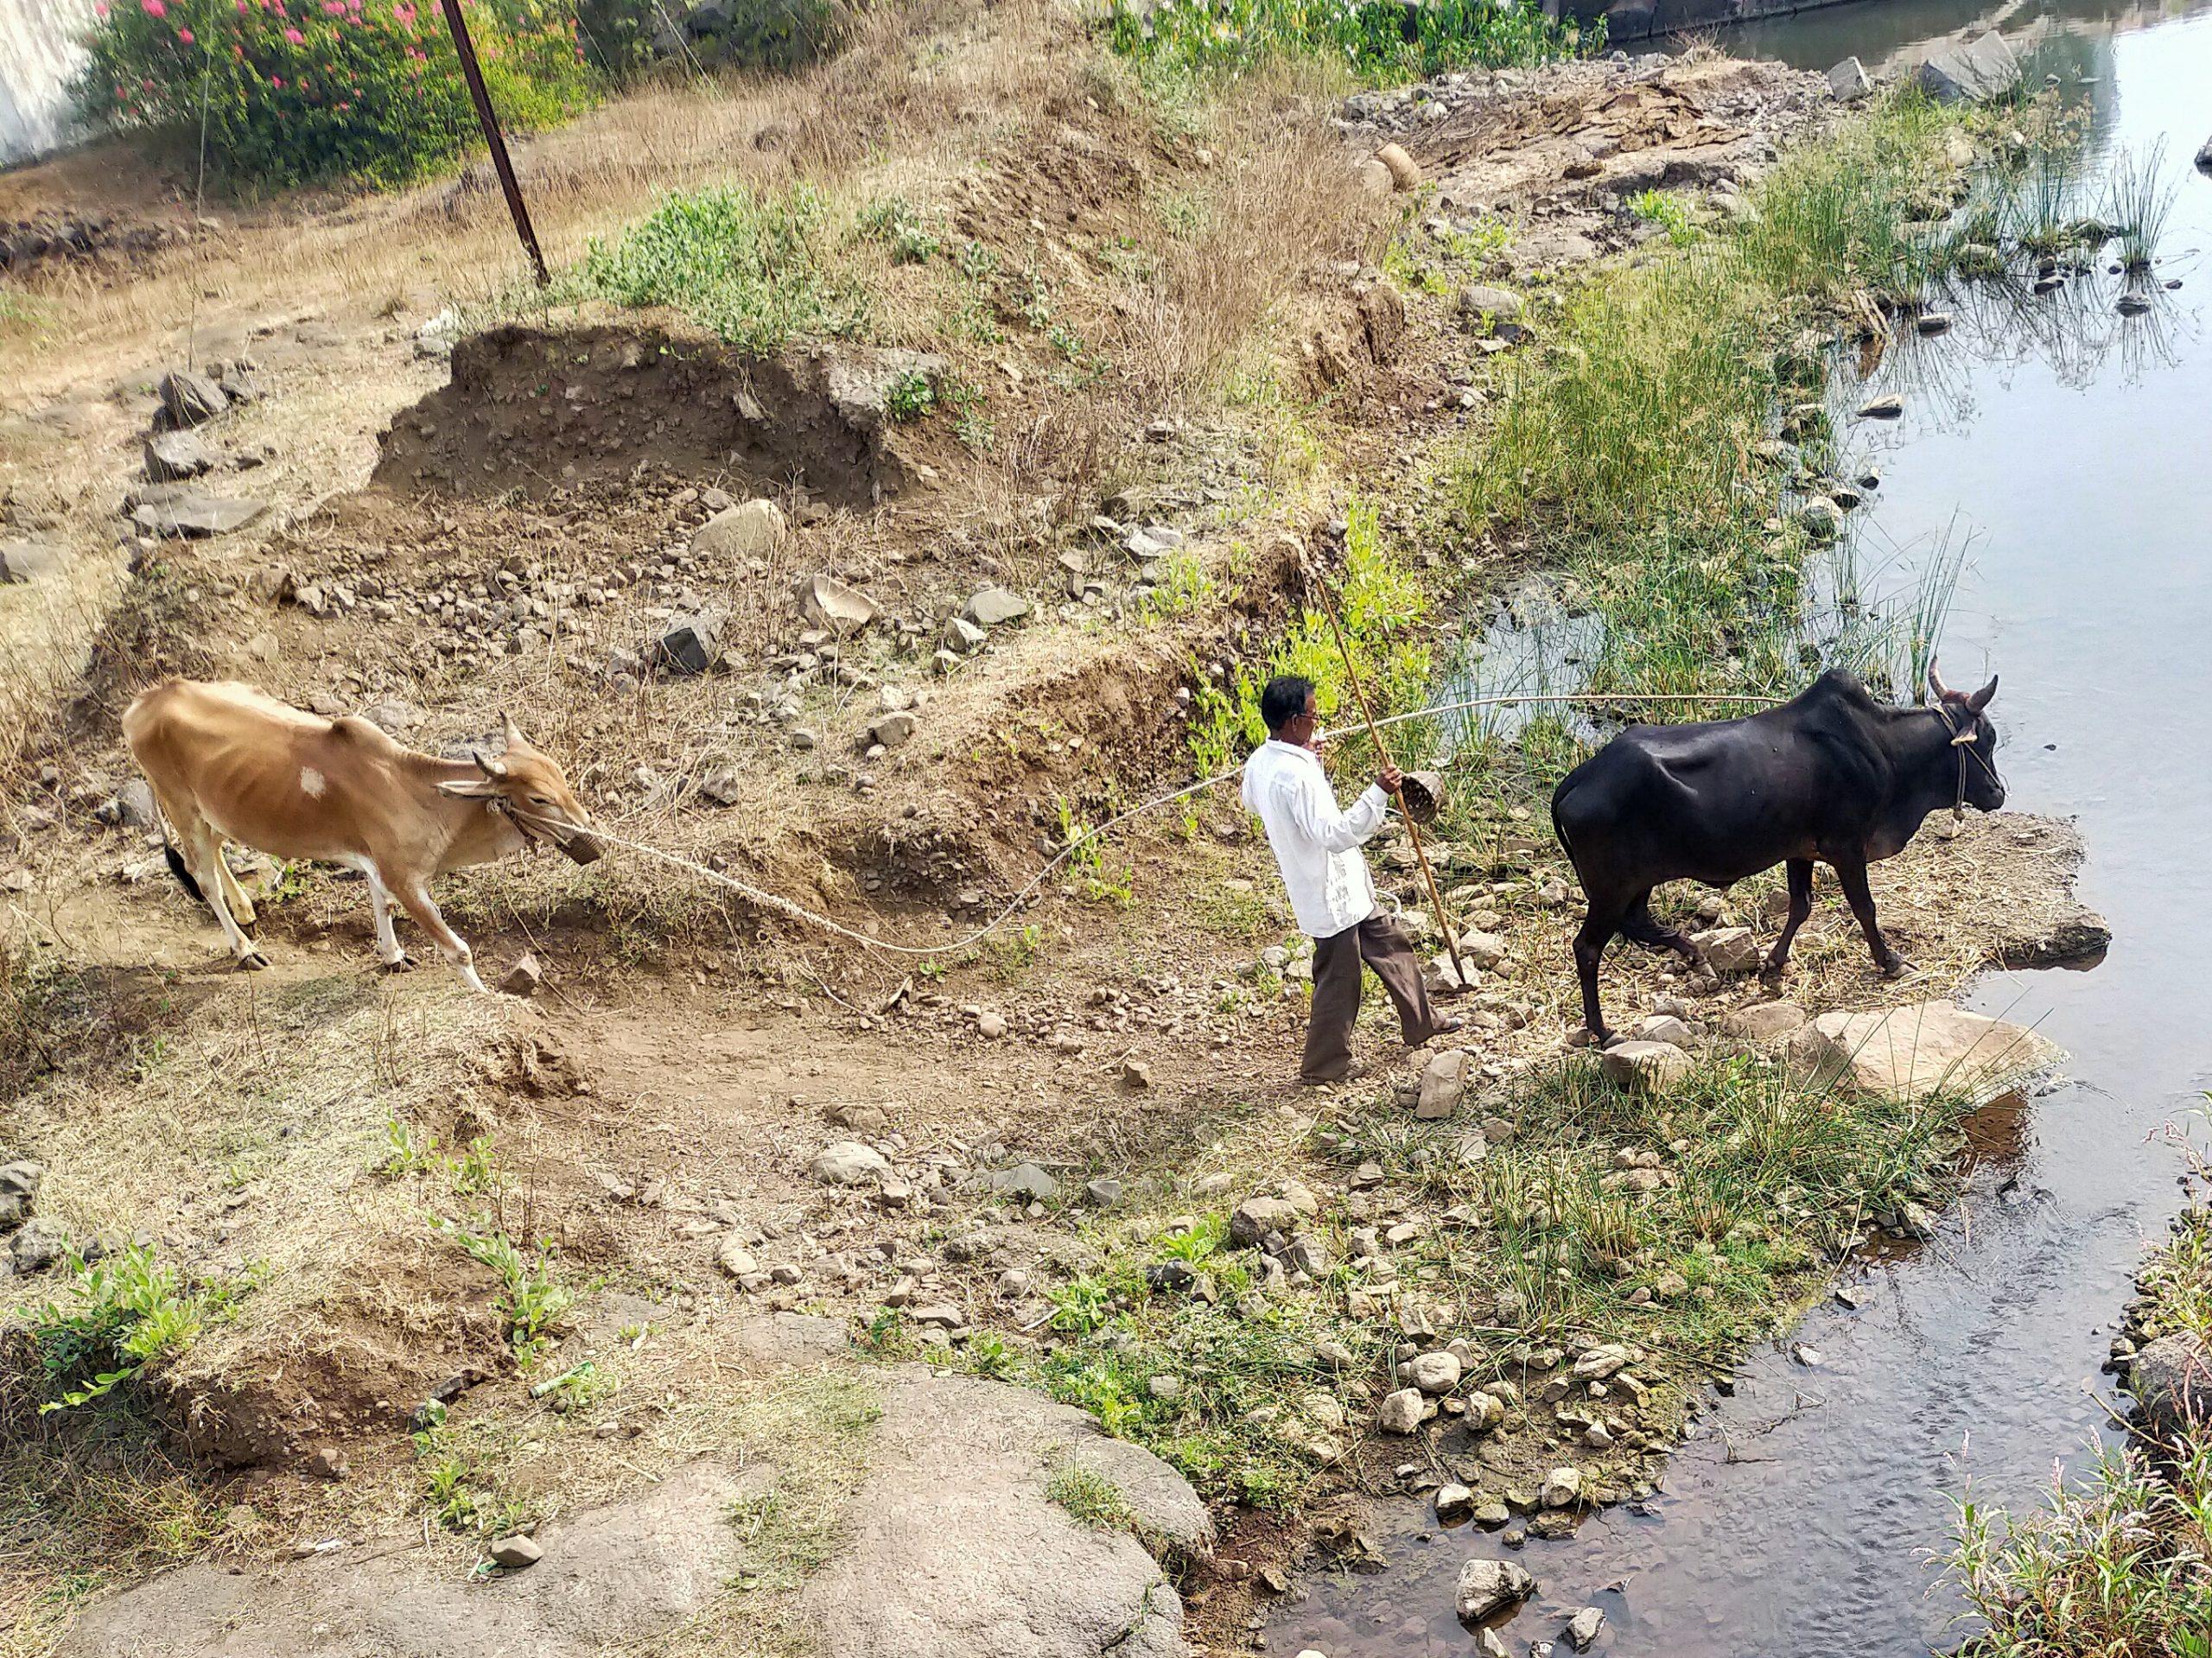 Farmer with oxen near river